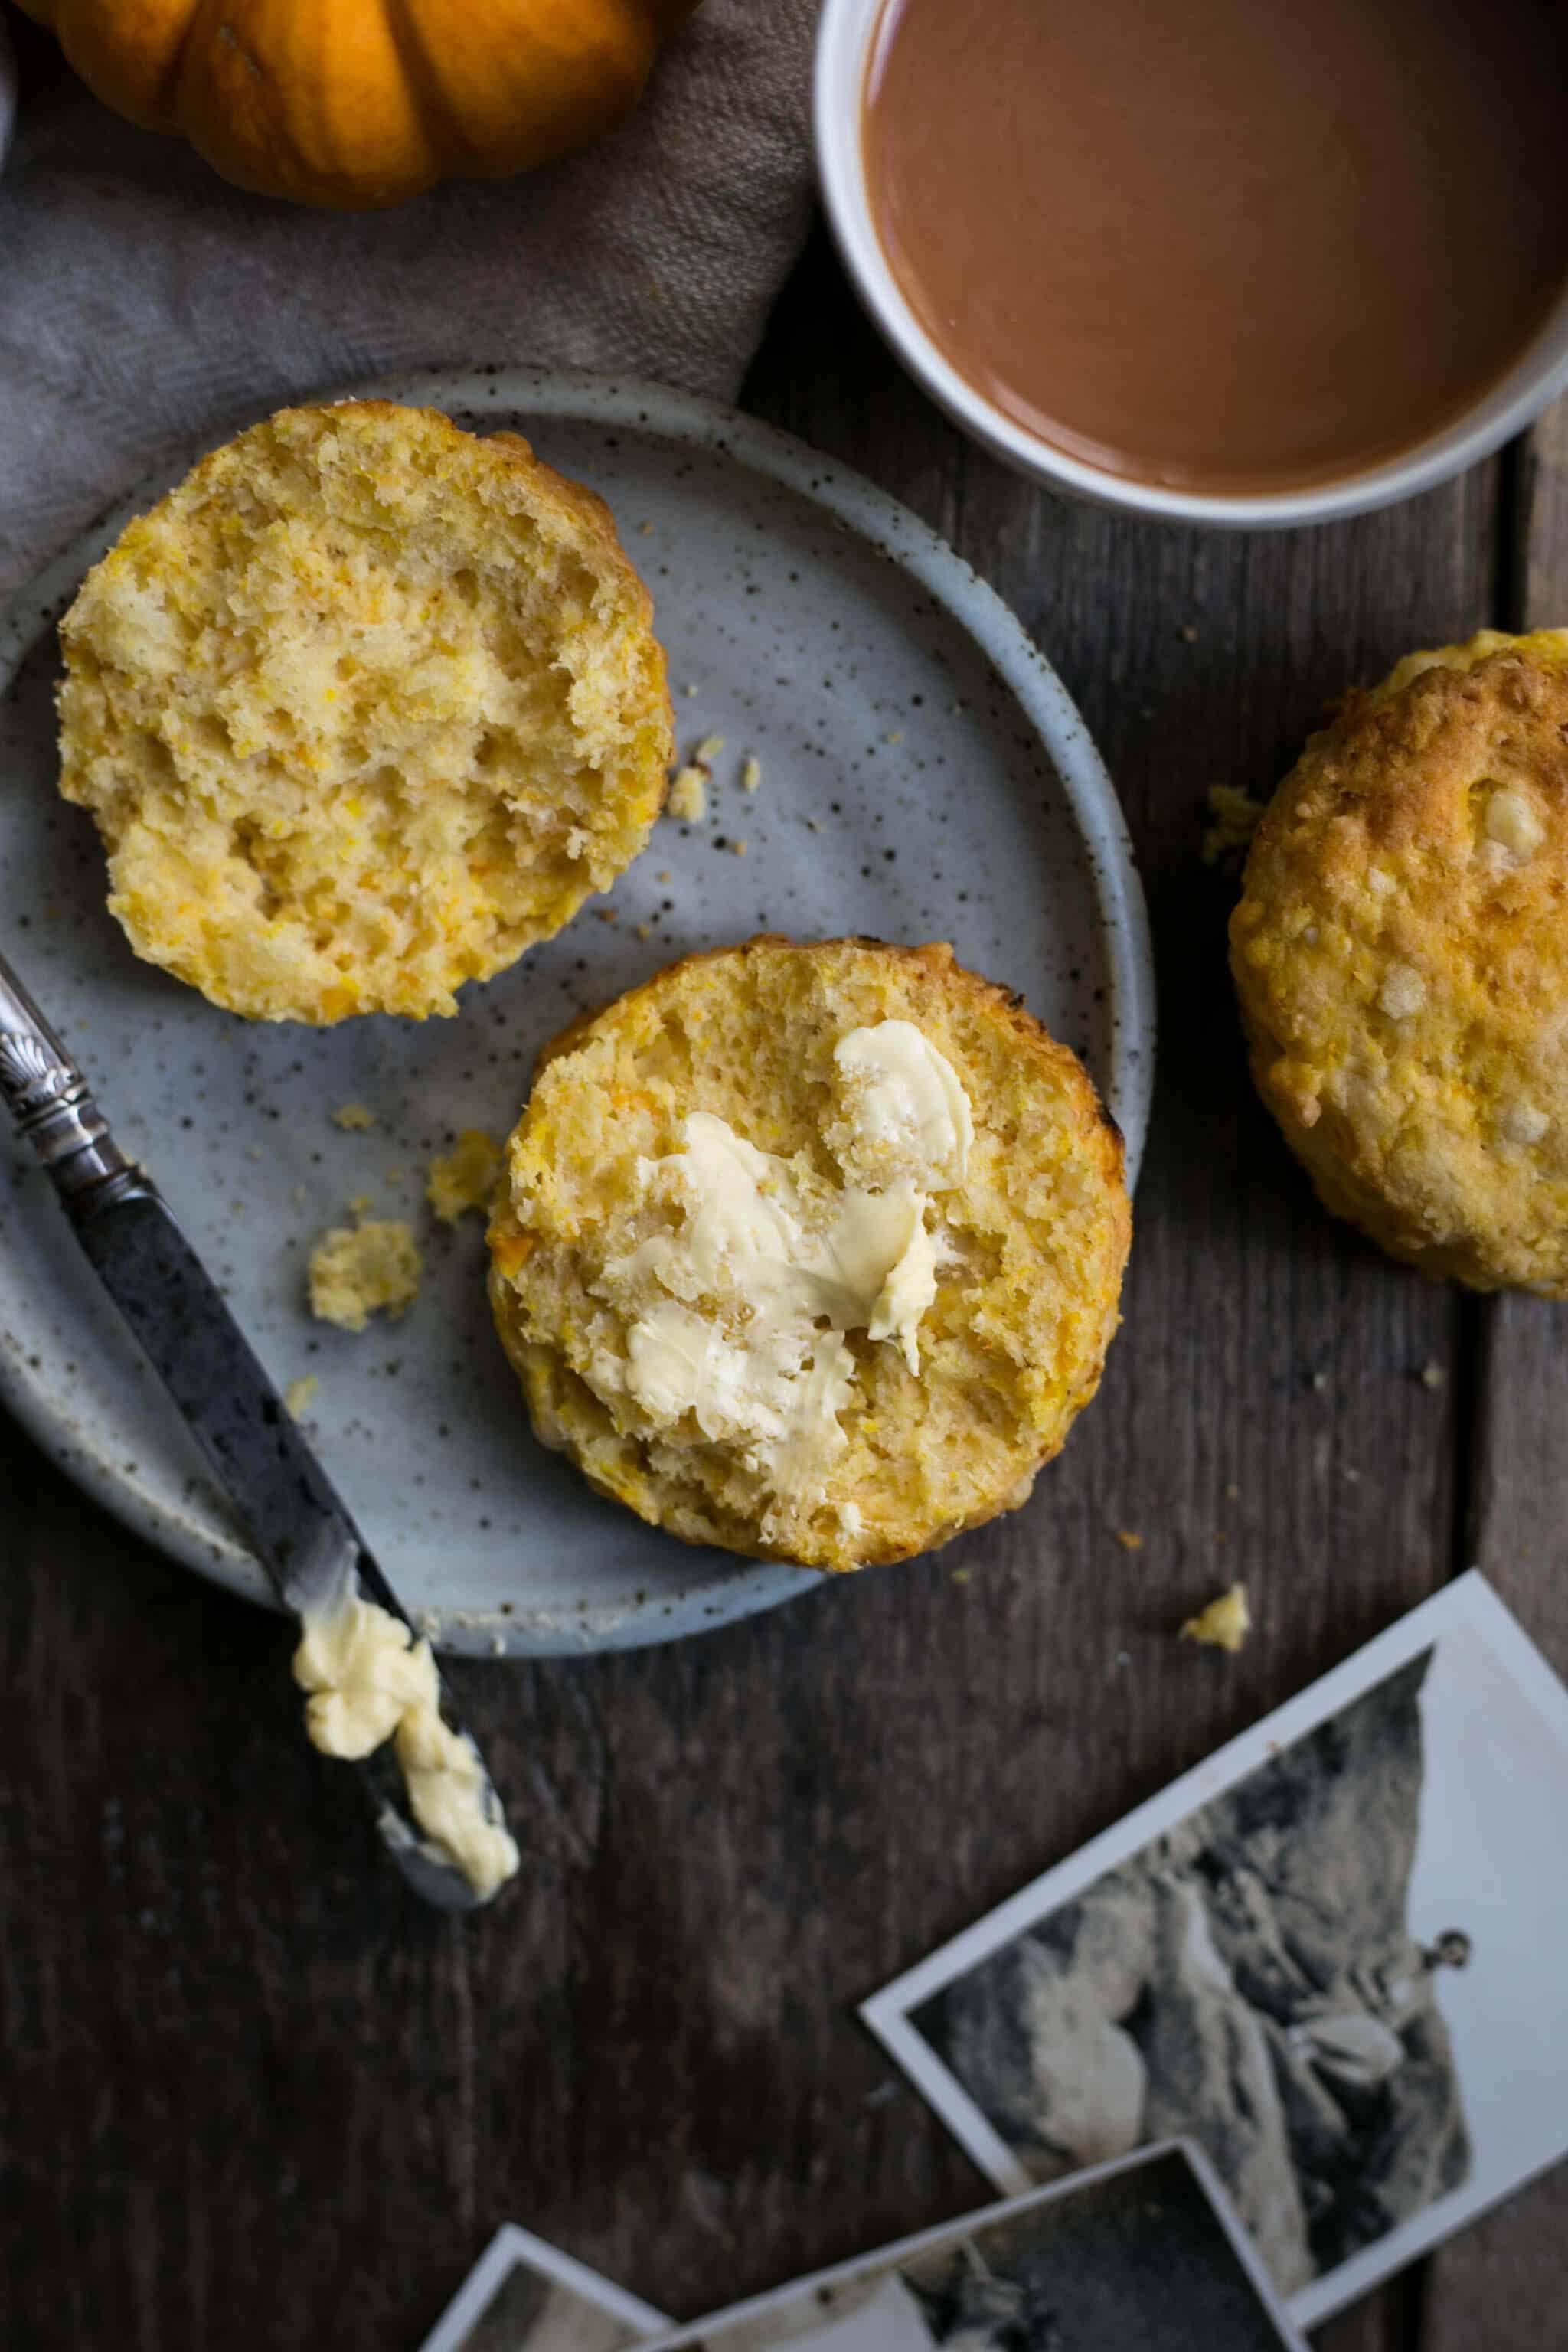 Super easy pumpkin scones recipe. Delicious savoury version of the classic scone #vegan #scones   via @annabanana.co